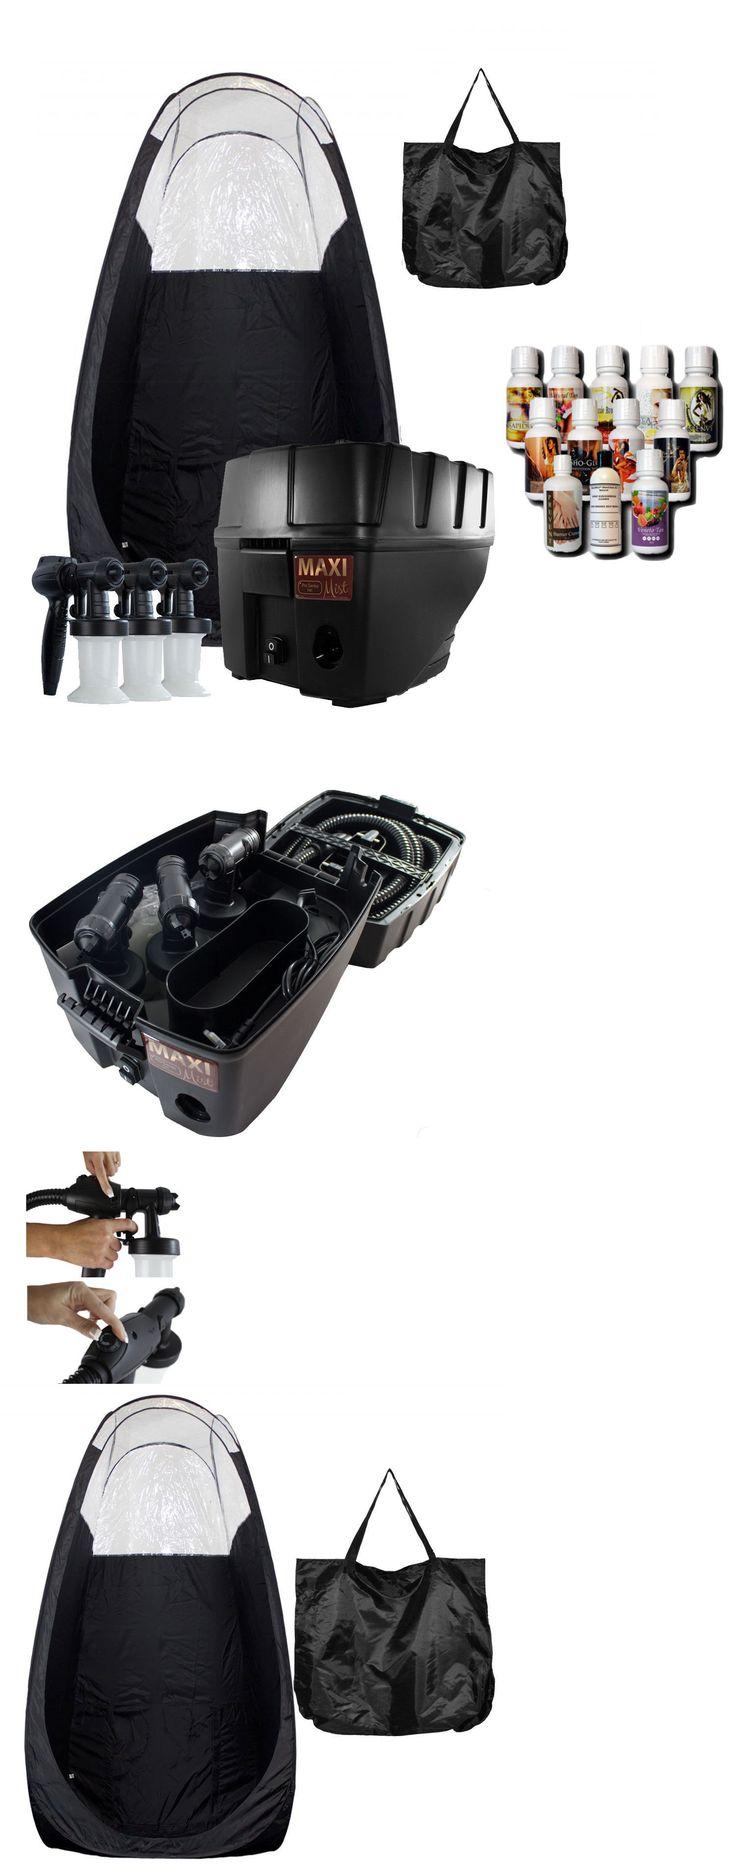 Airbrush Tanning Kits: Maximist Pro Tnt Quiet Hvlp Spray Tan Kit W Black Tent W Tampa Bay Tan Spray -> BUY IT NOW ONLY: $549 on eBay!